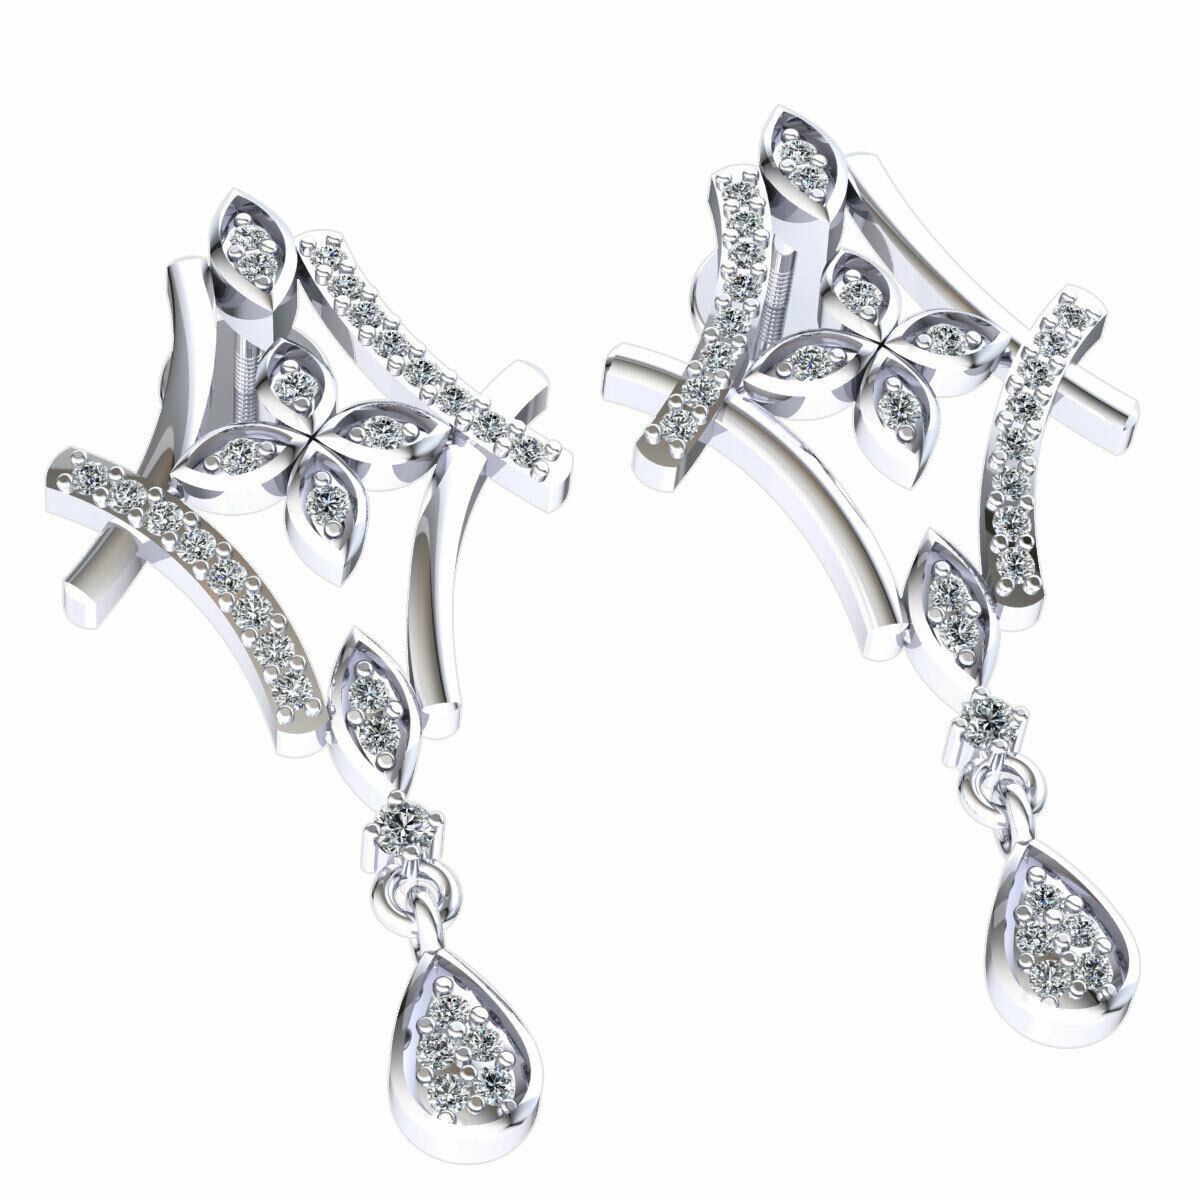 Natural 0.25ct Round Cut Diamond Ladies Flower Drop Earrings Solid 10K gold